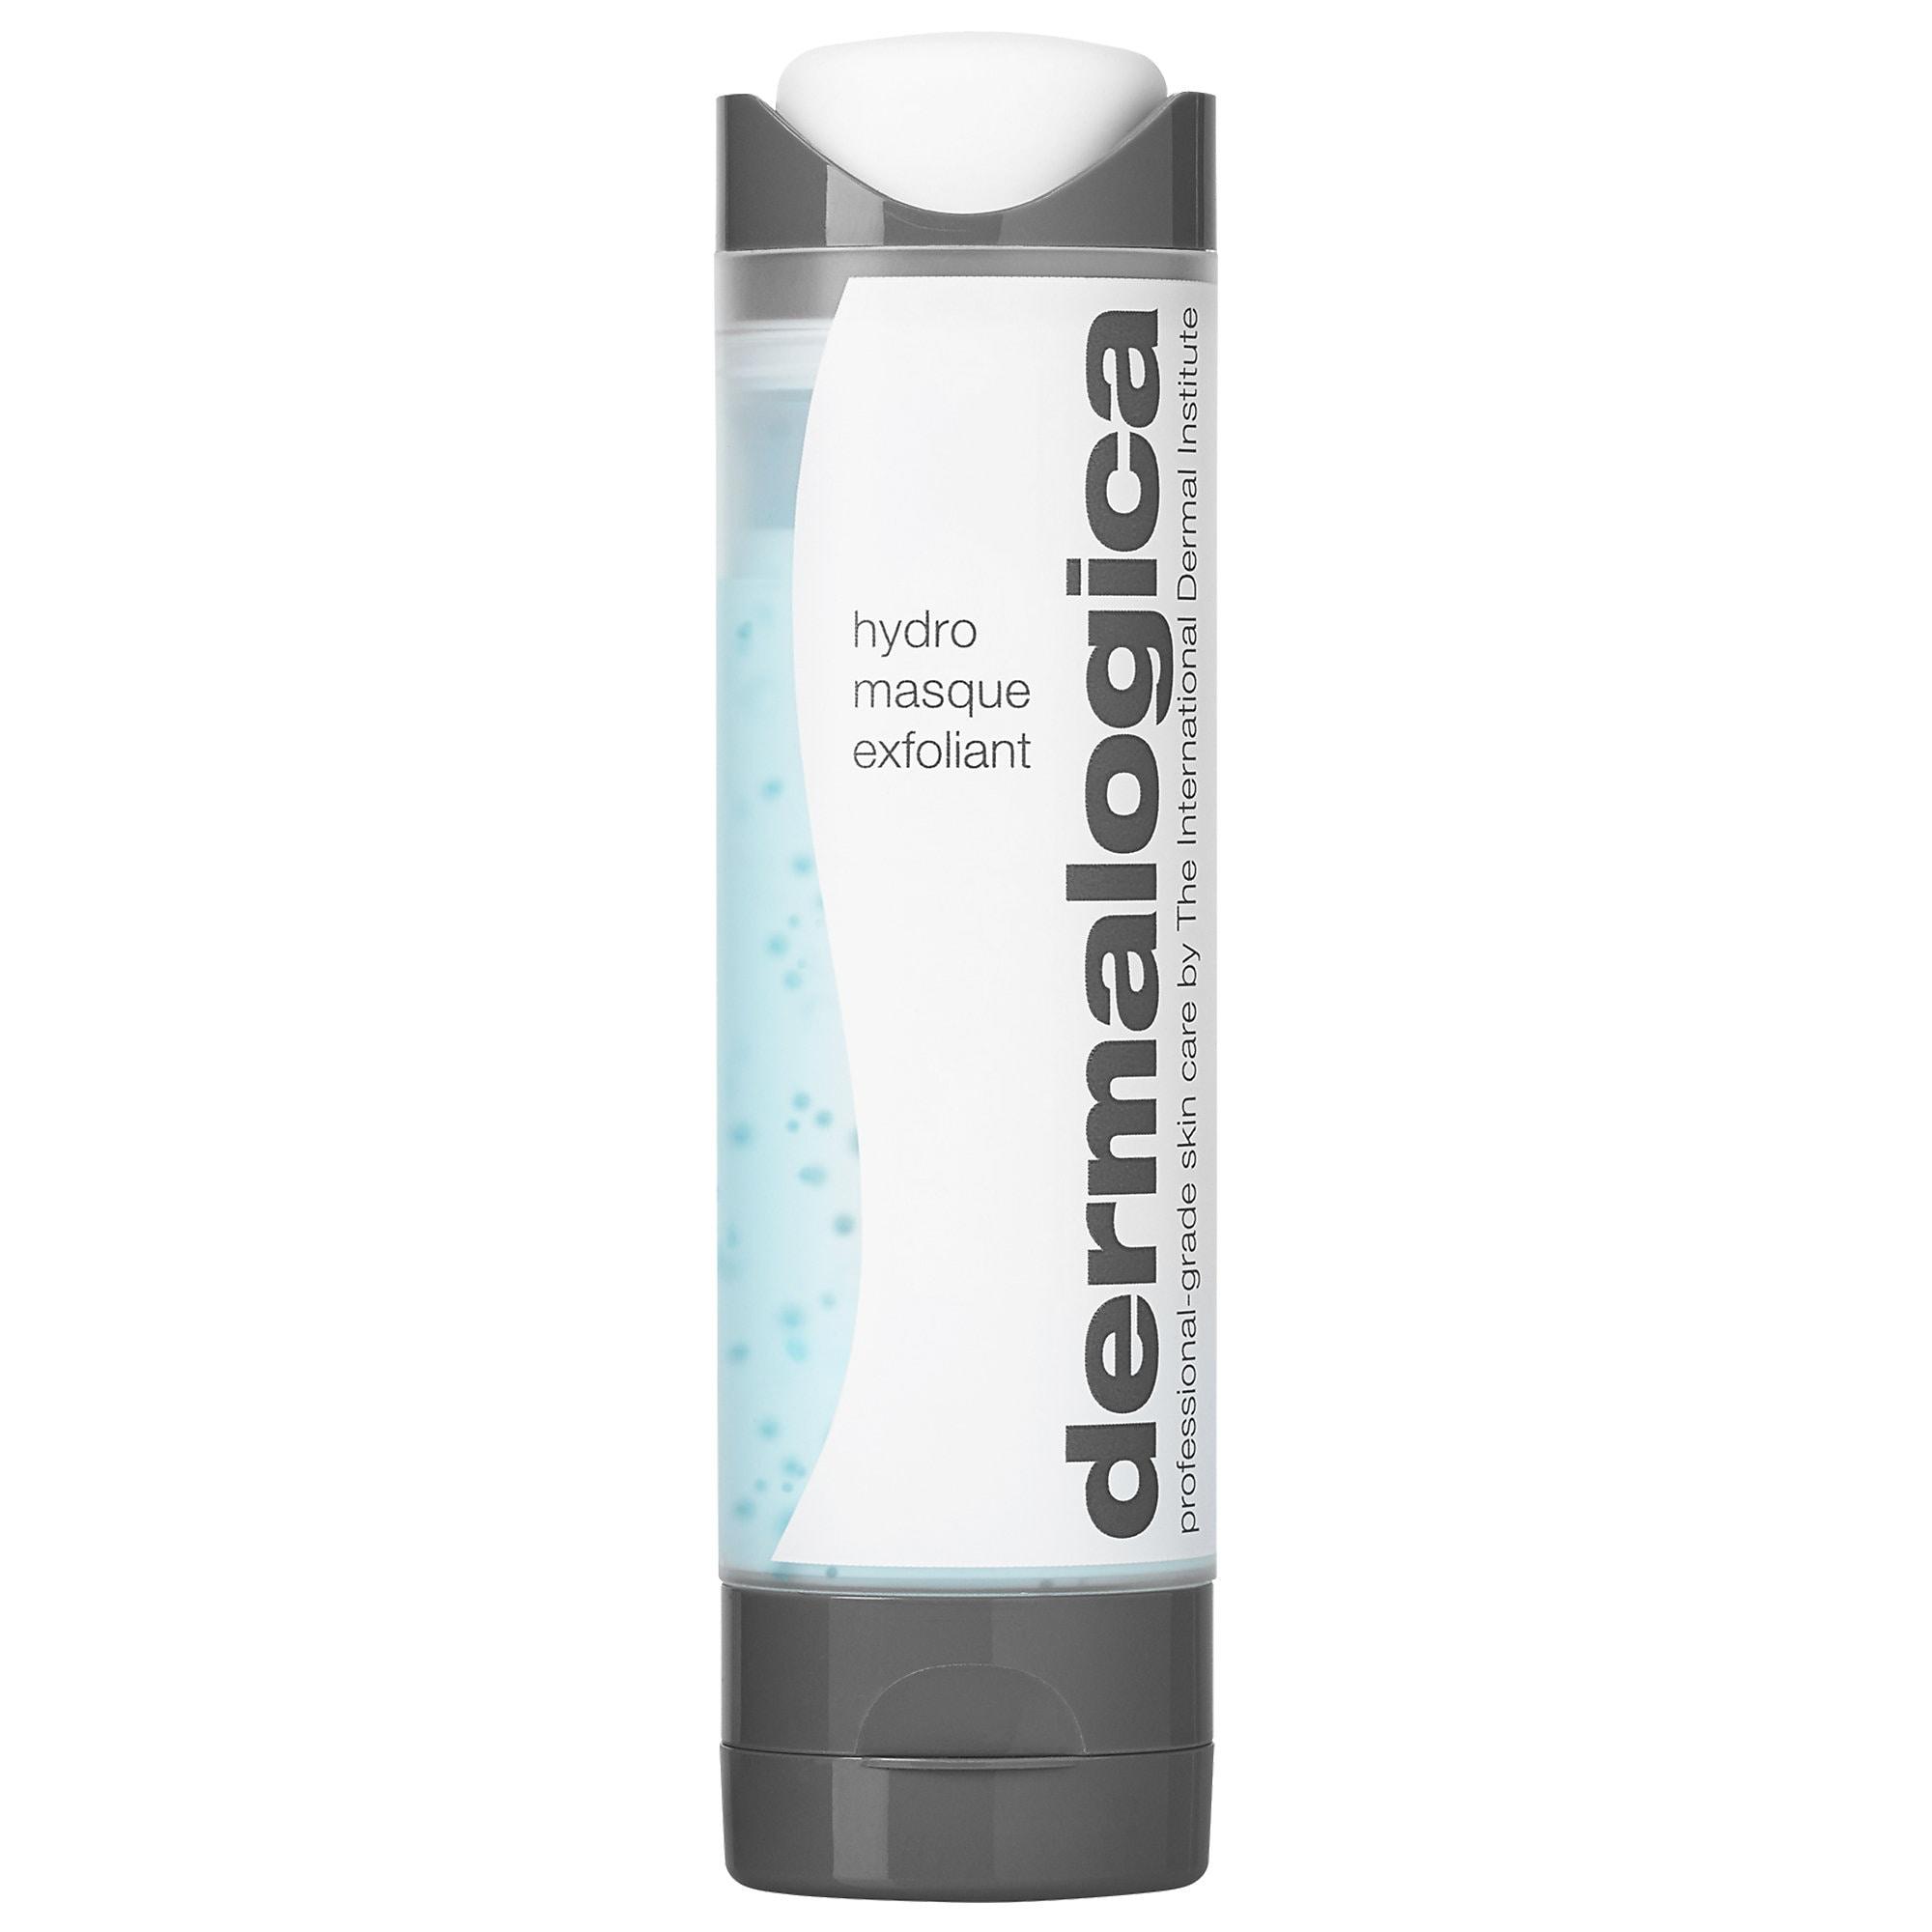 Dermalogica - Hydro Masque Exfoliant